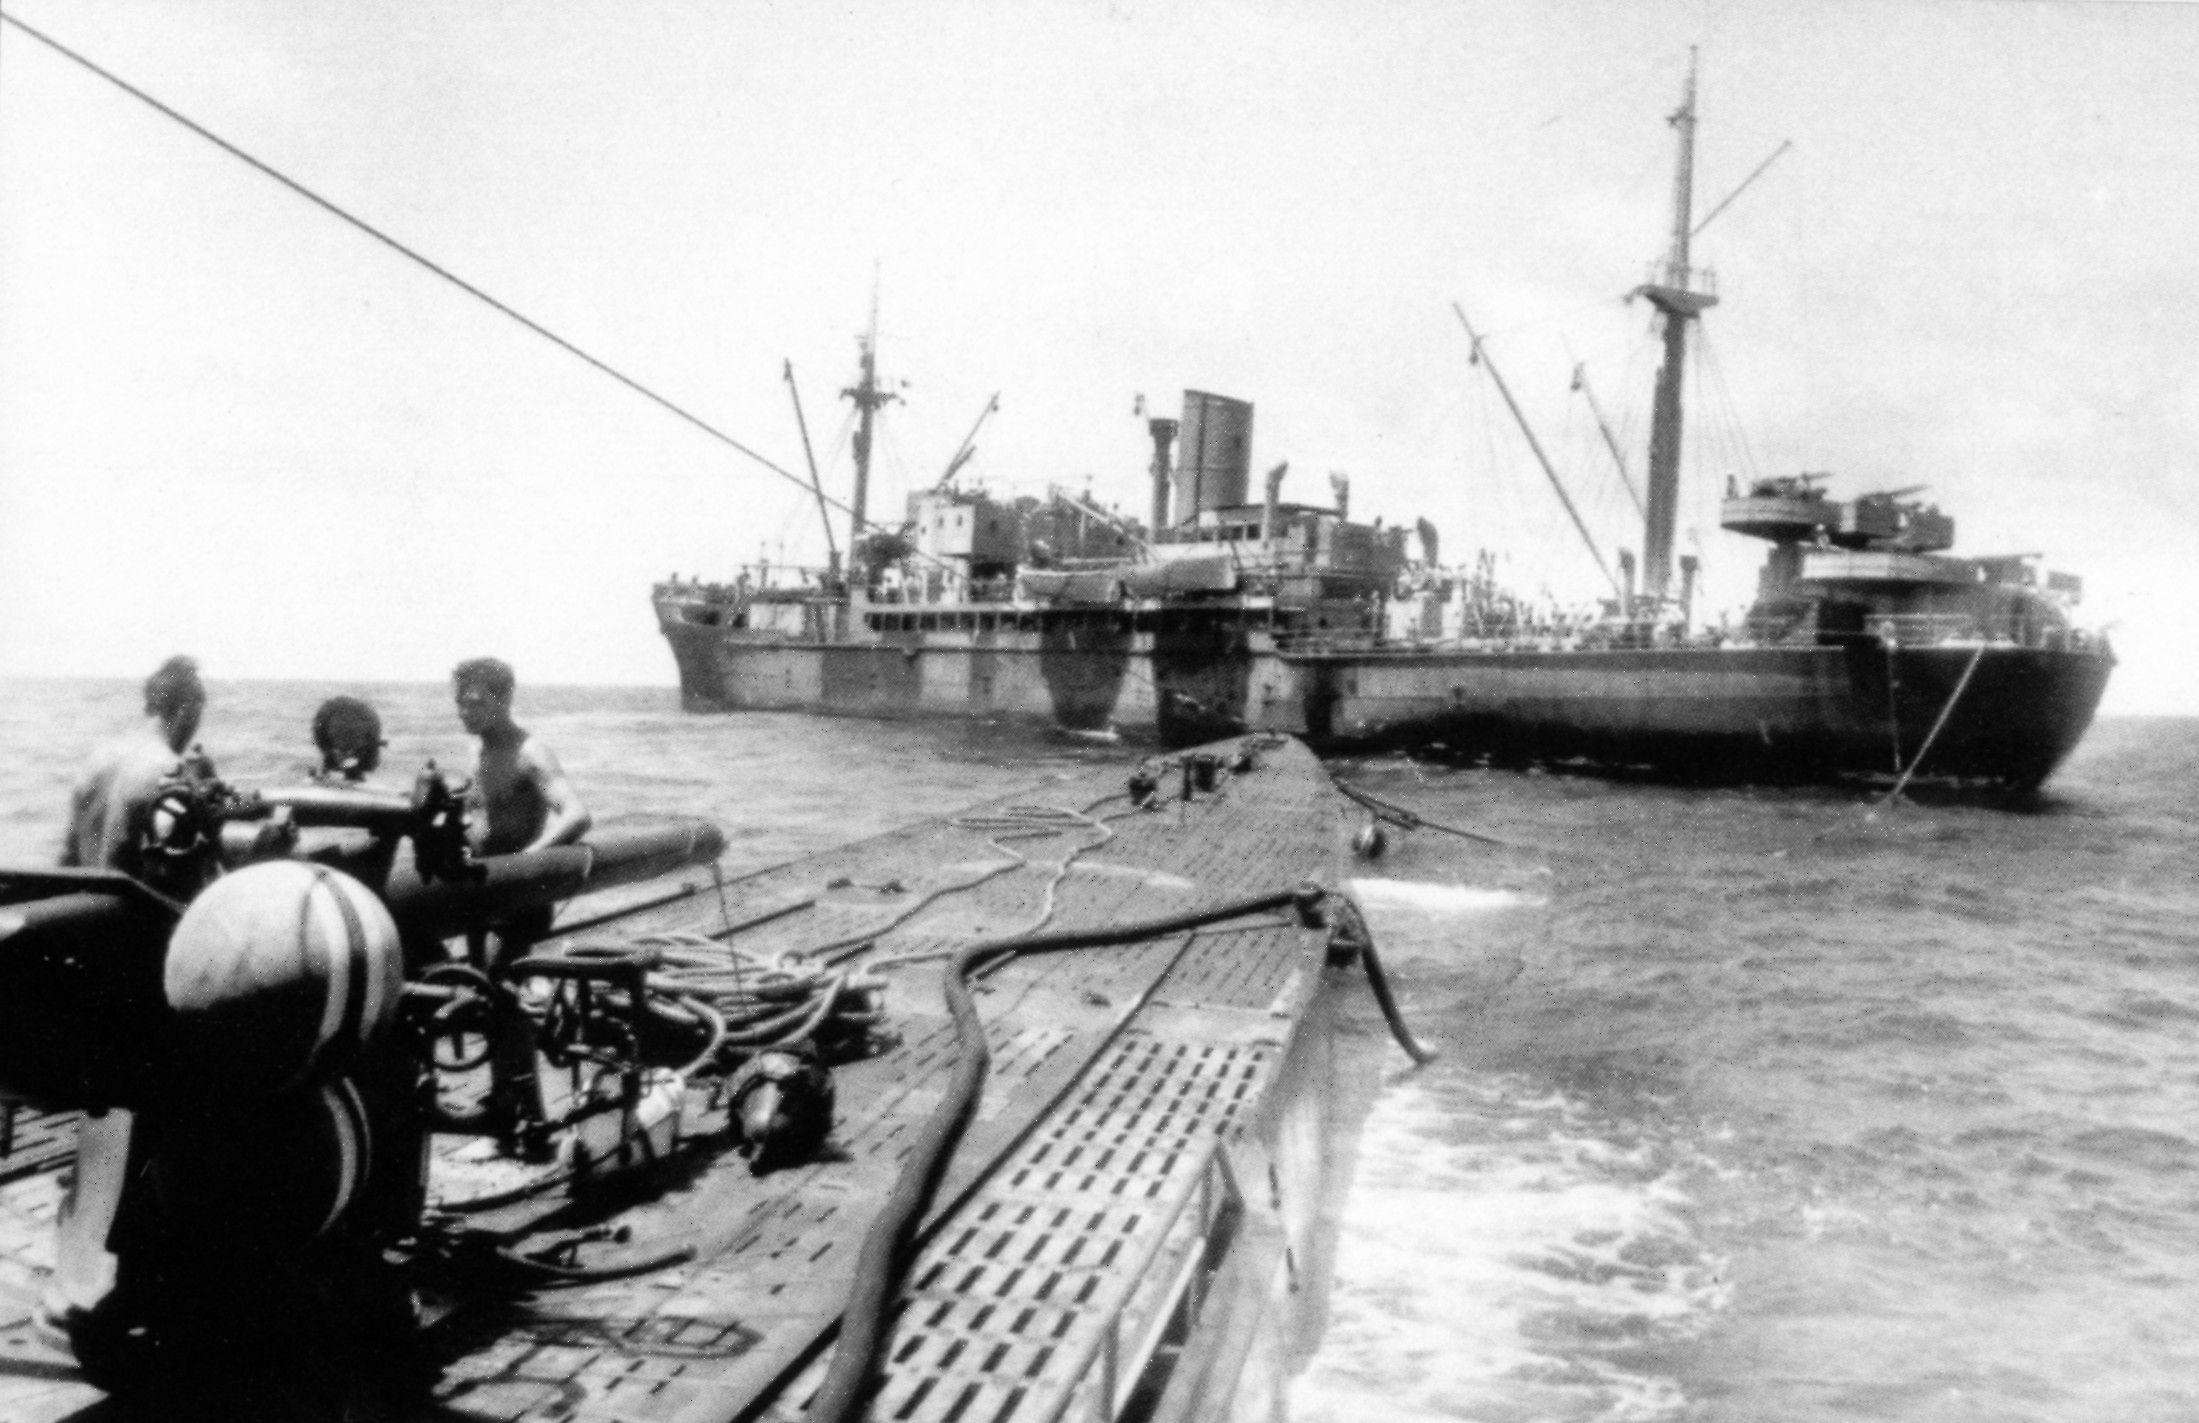 German sub U-124 refueling at sea. The supply vessel is ...